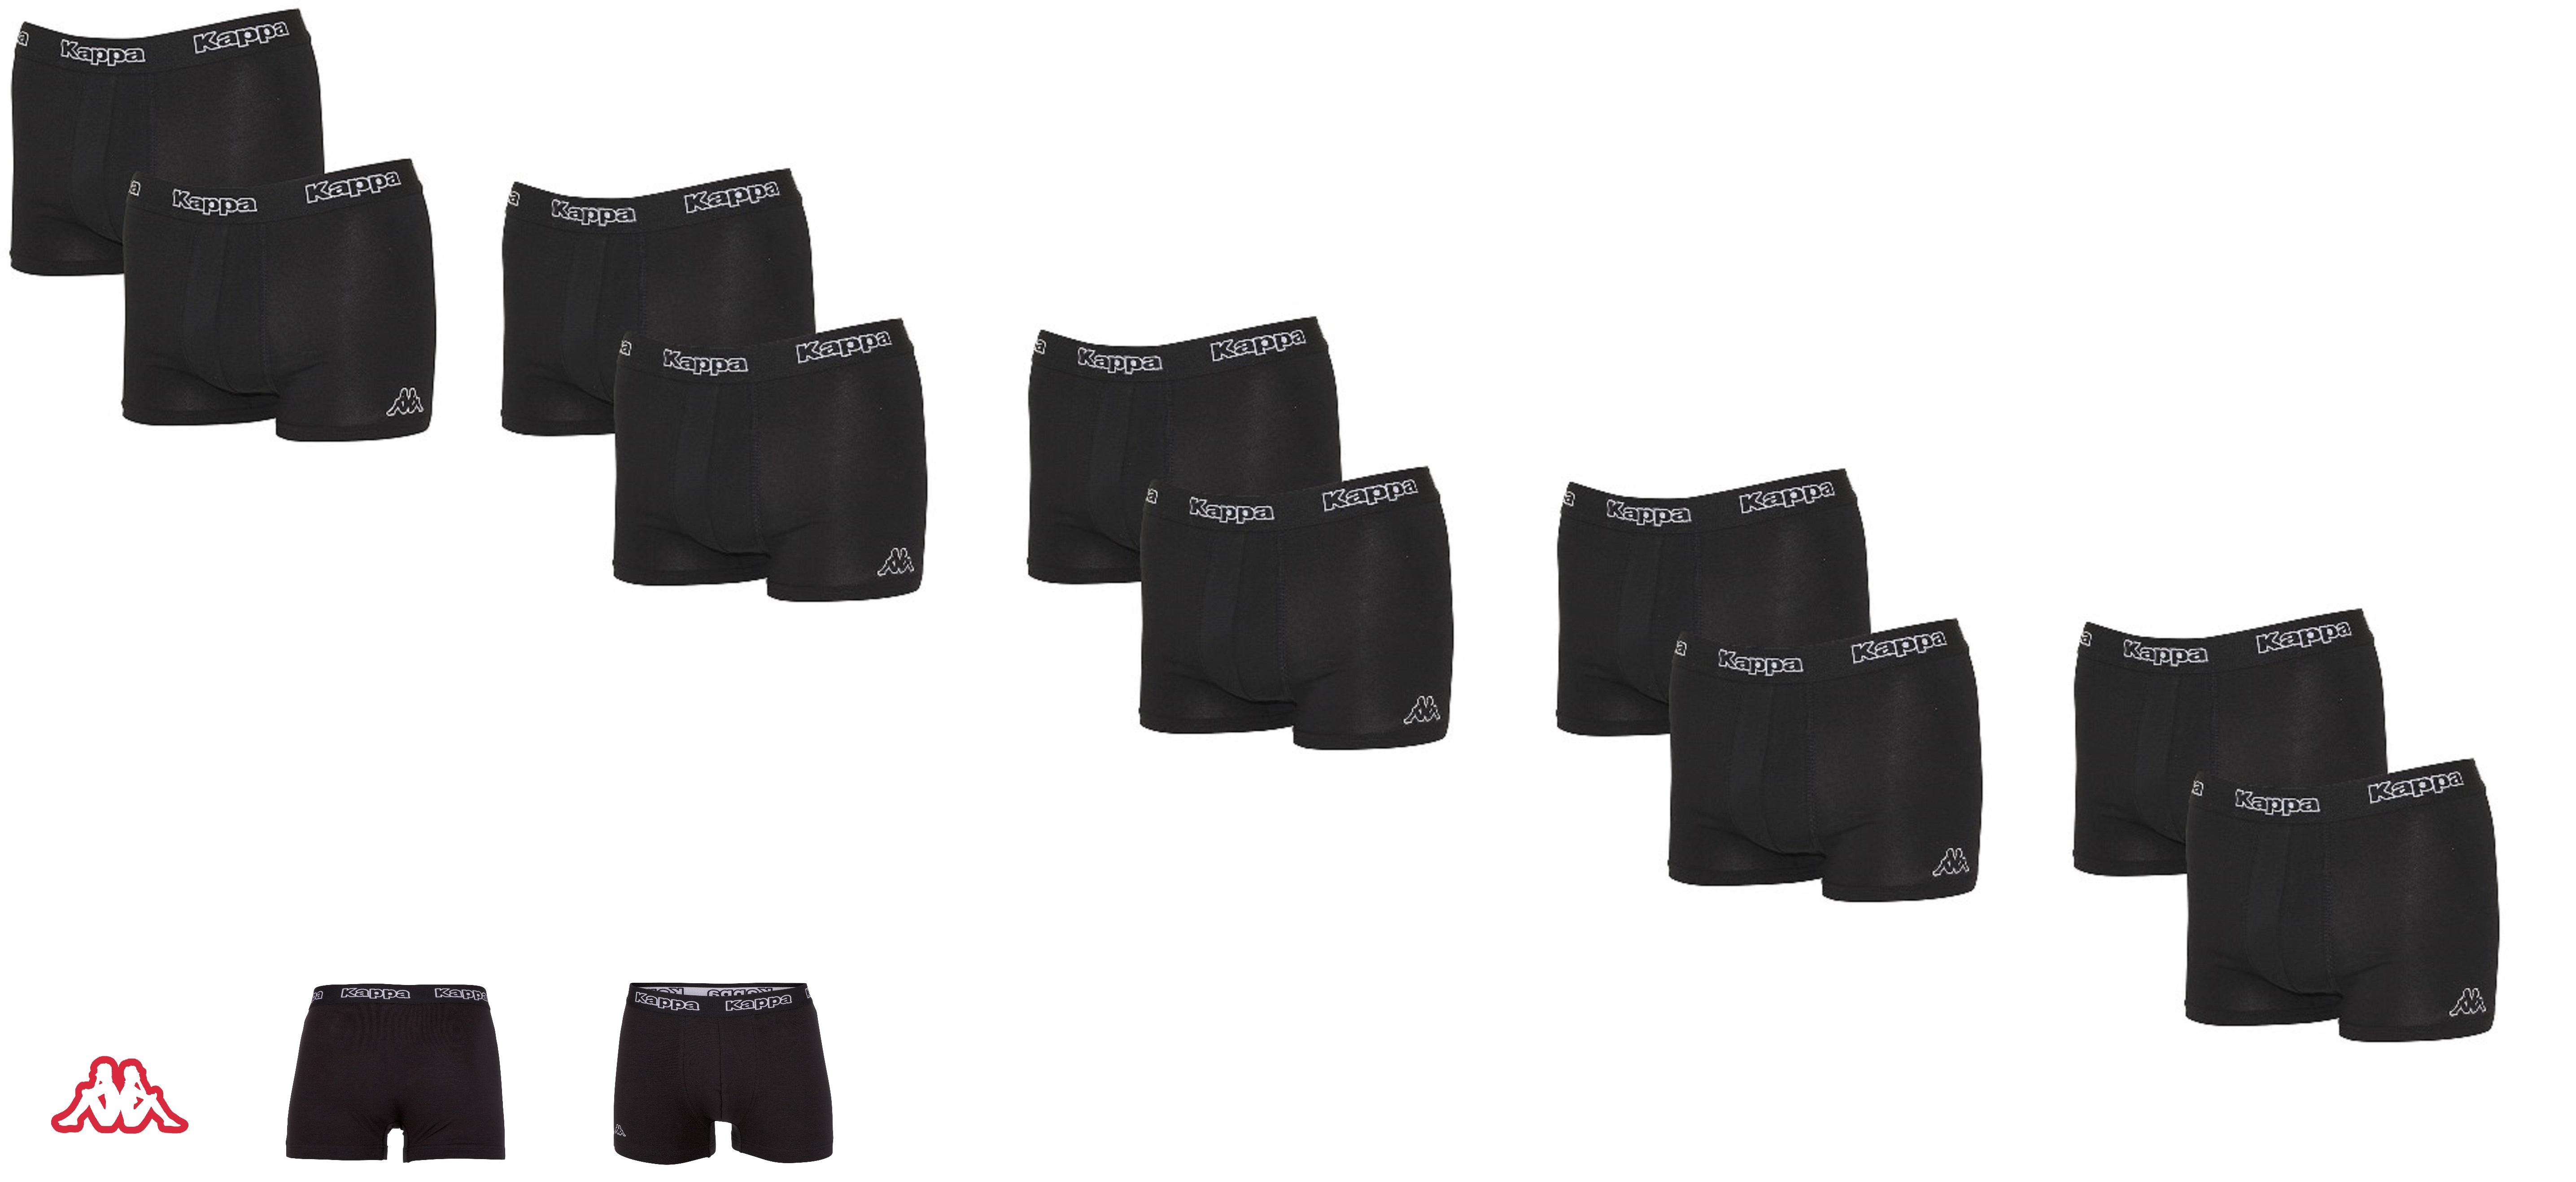 Kappa 10er Pack Boxershorts Herren,  Unterwäsche Boxershort Herrenshort 95% Baumwolle , Gr. S , in S